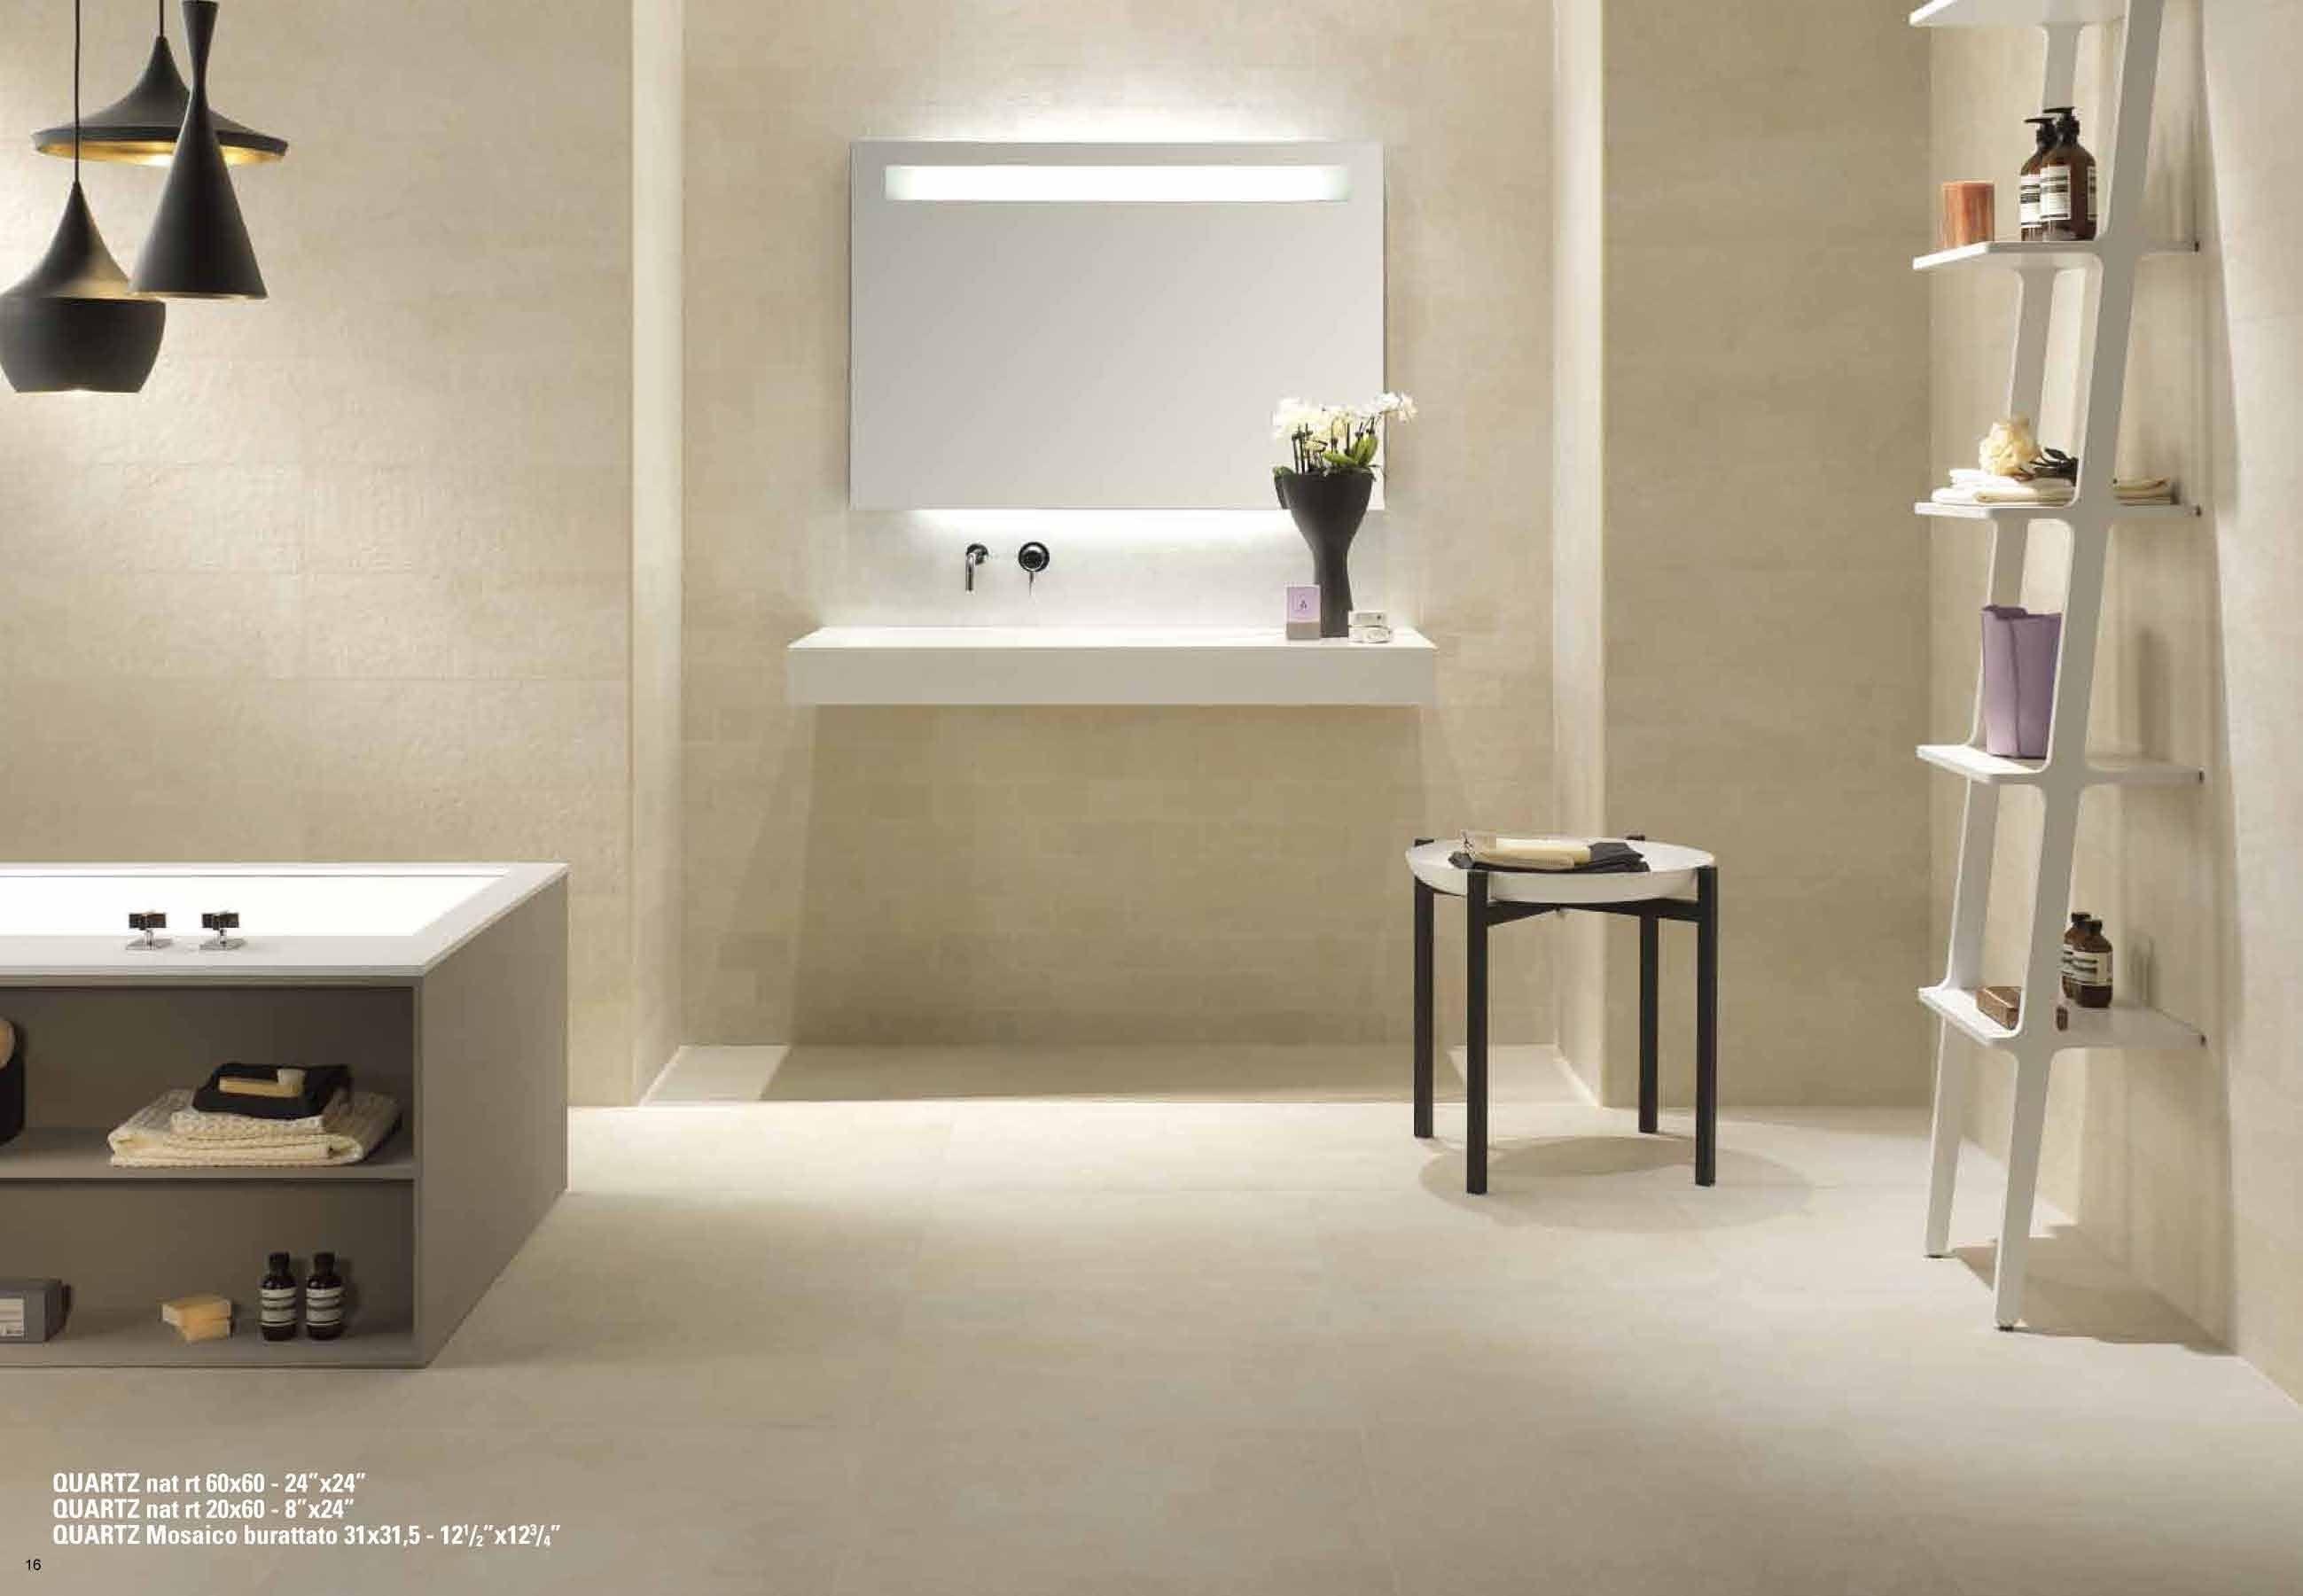 Keope #Sunrise Quartz 20x60 cm O121 | #Ceramic #Stone #20x60 | on ...